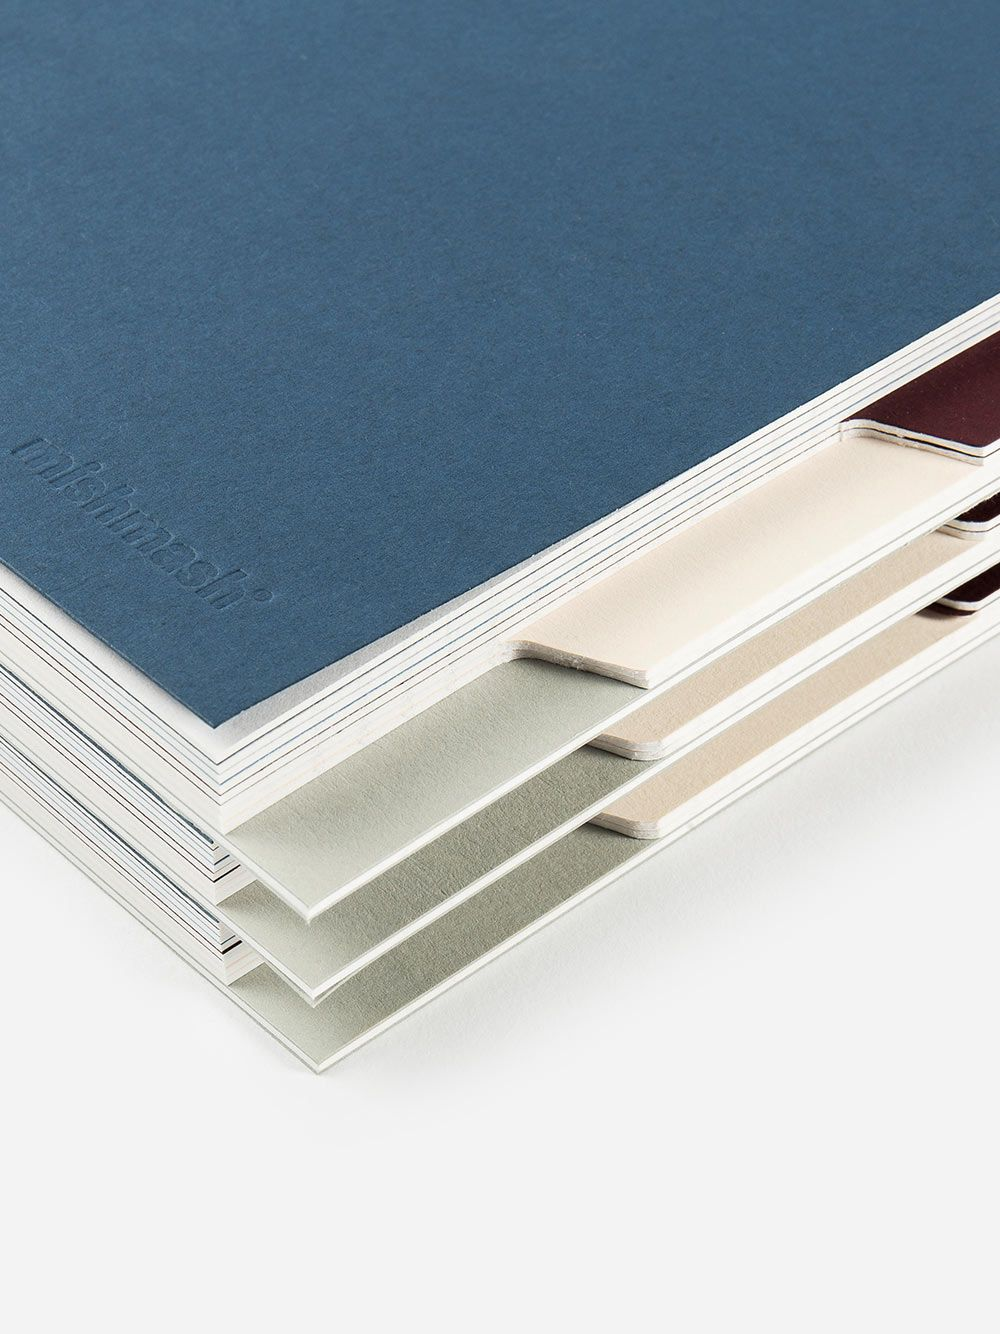 Cobalt Notebook | Mishmash